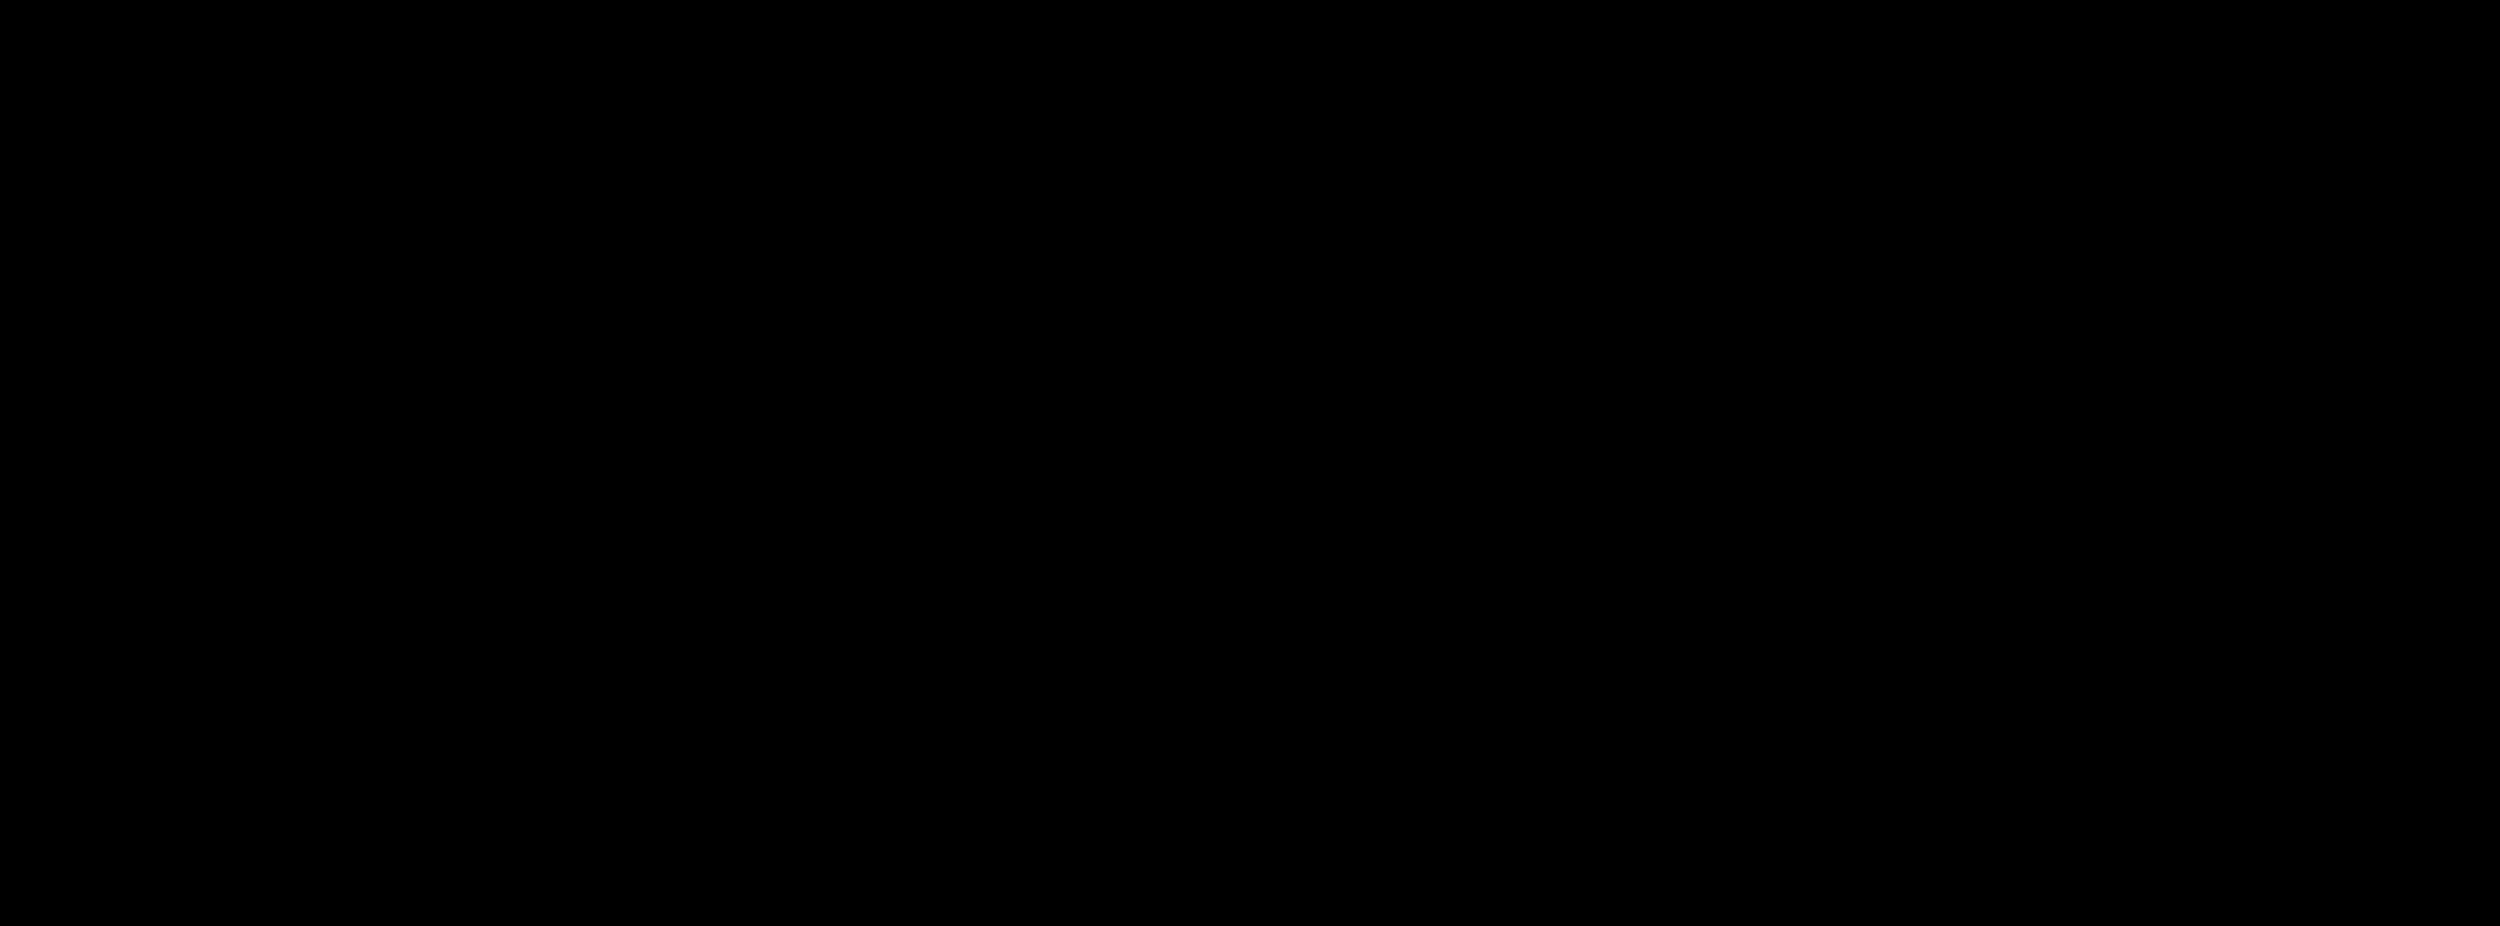 All black logo wtagline.png